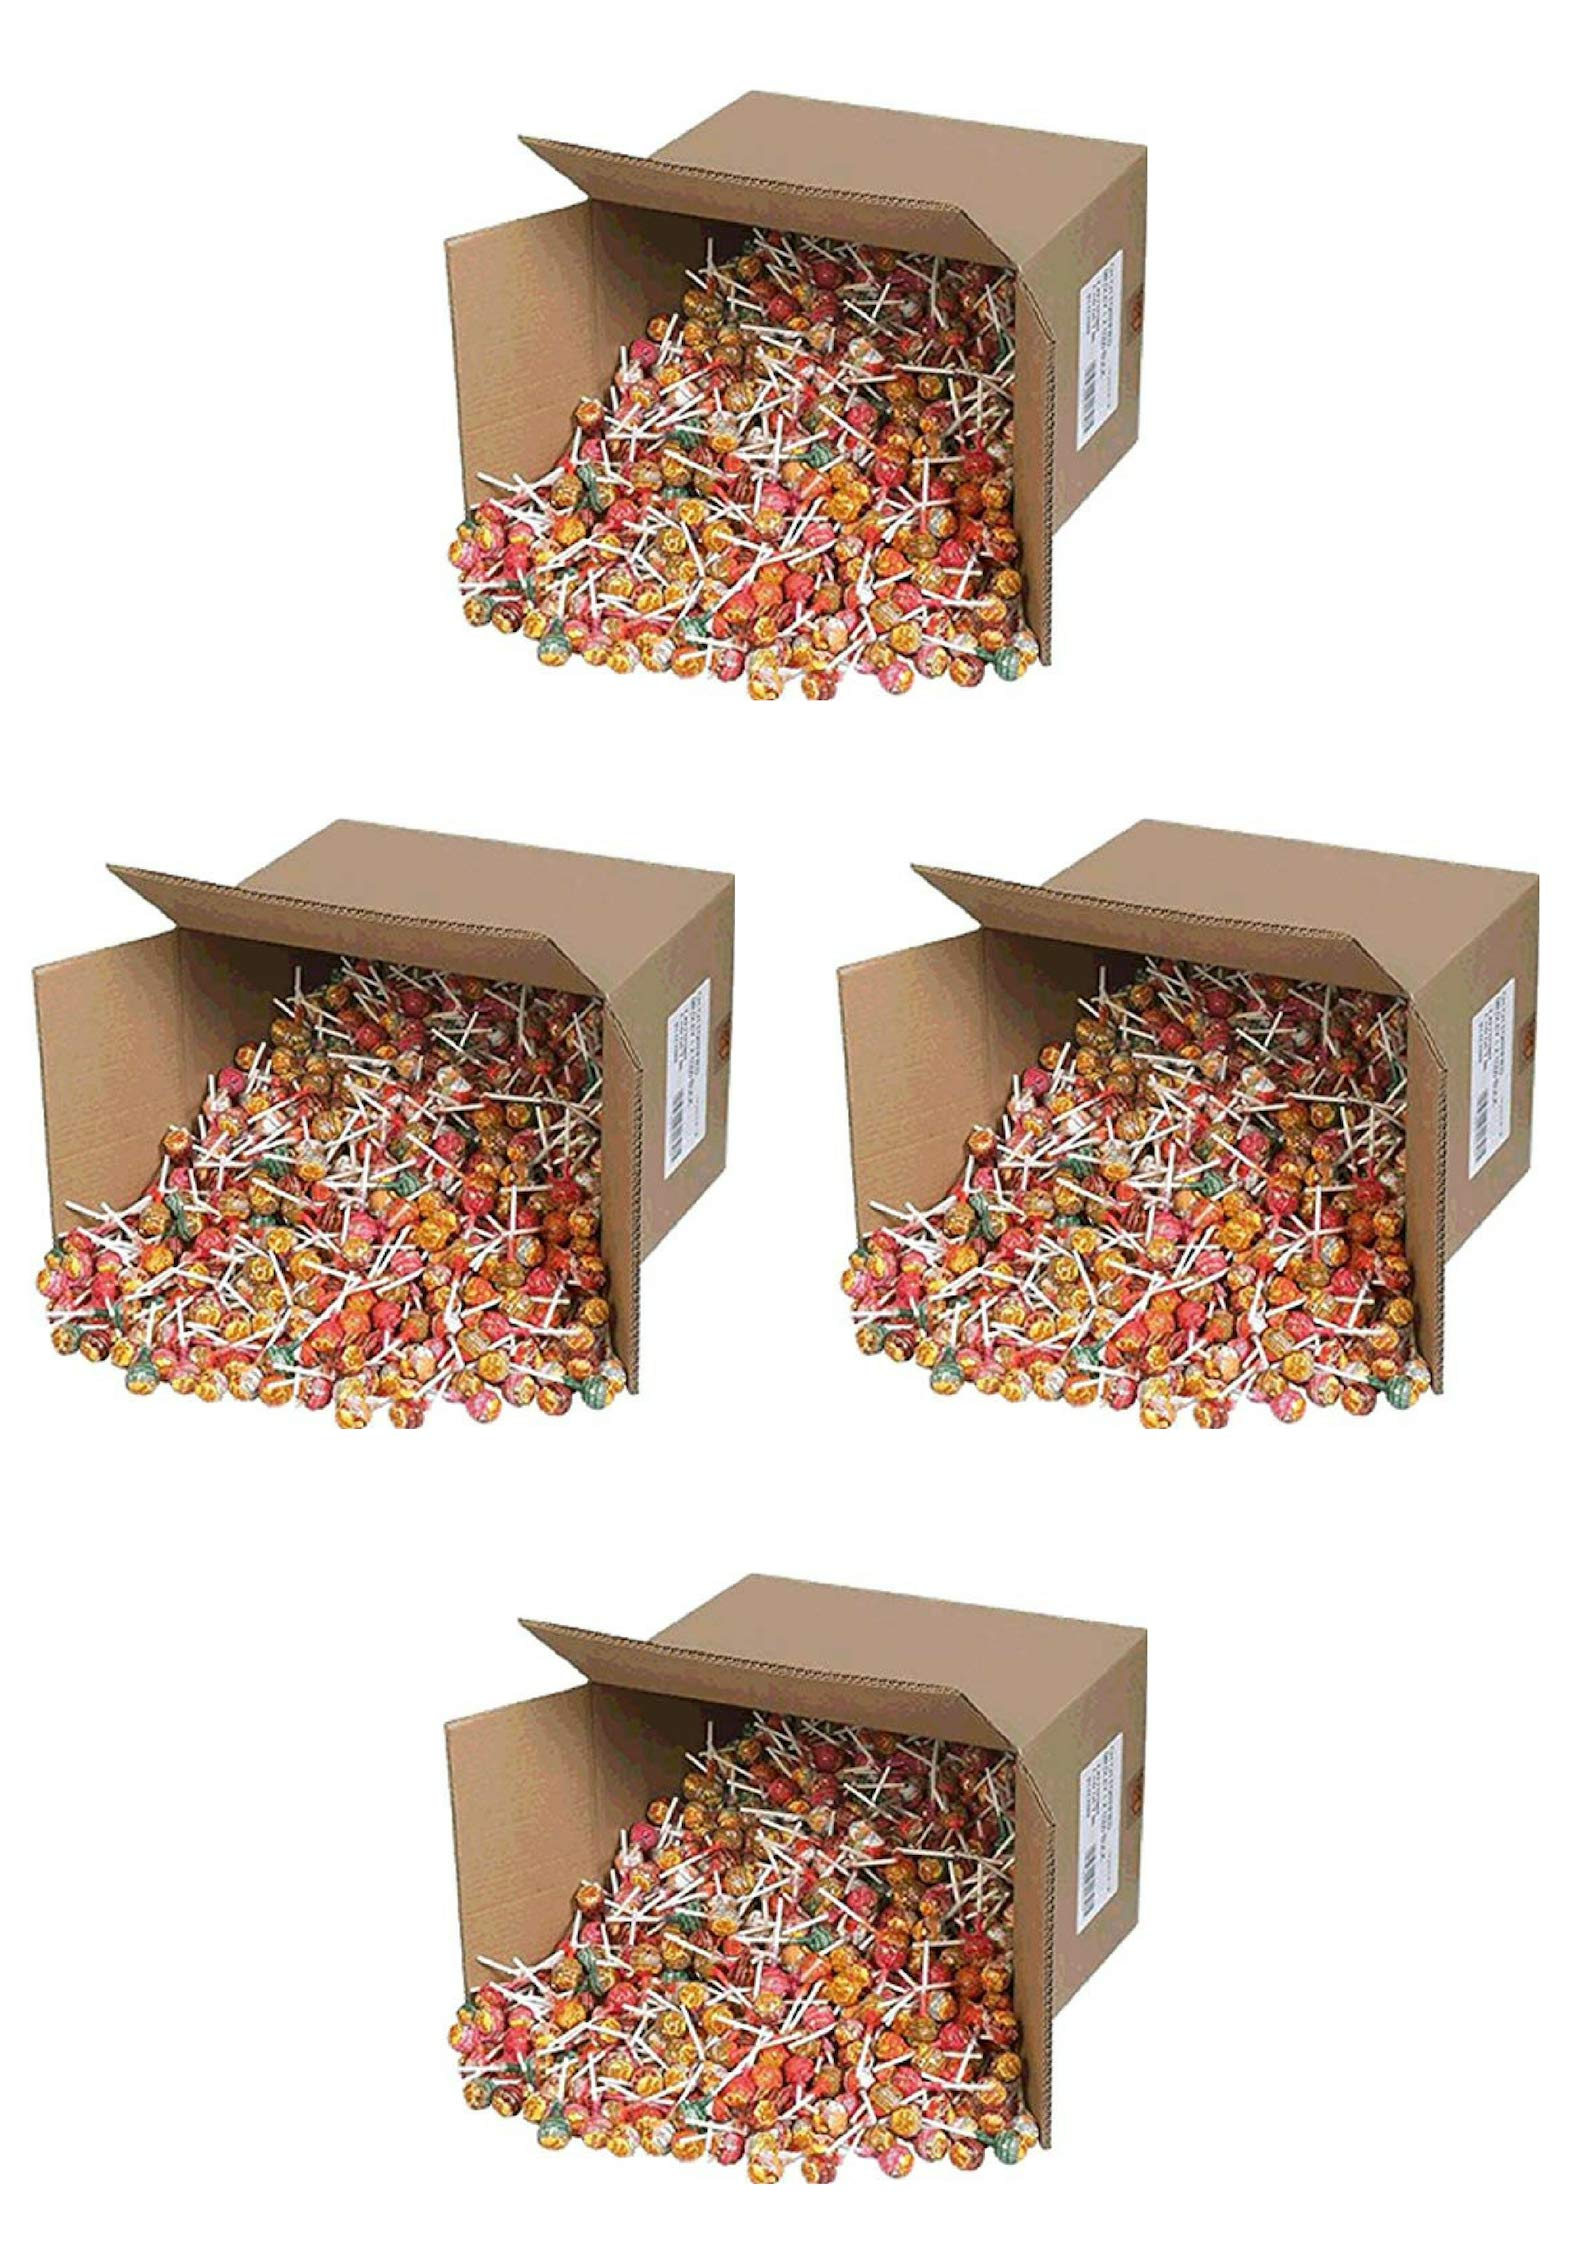 Chupa Chups Lollipops 1000 ct box (4 Pack) by Chupa Chups